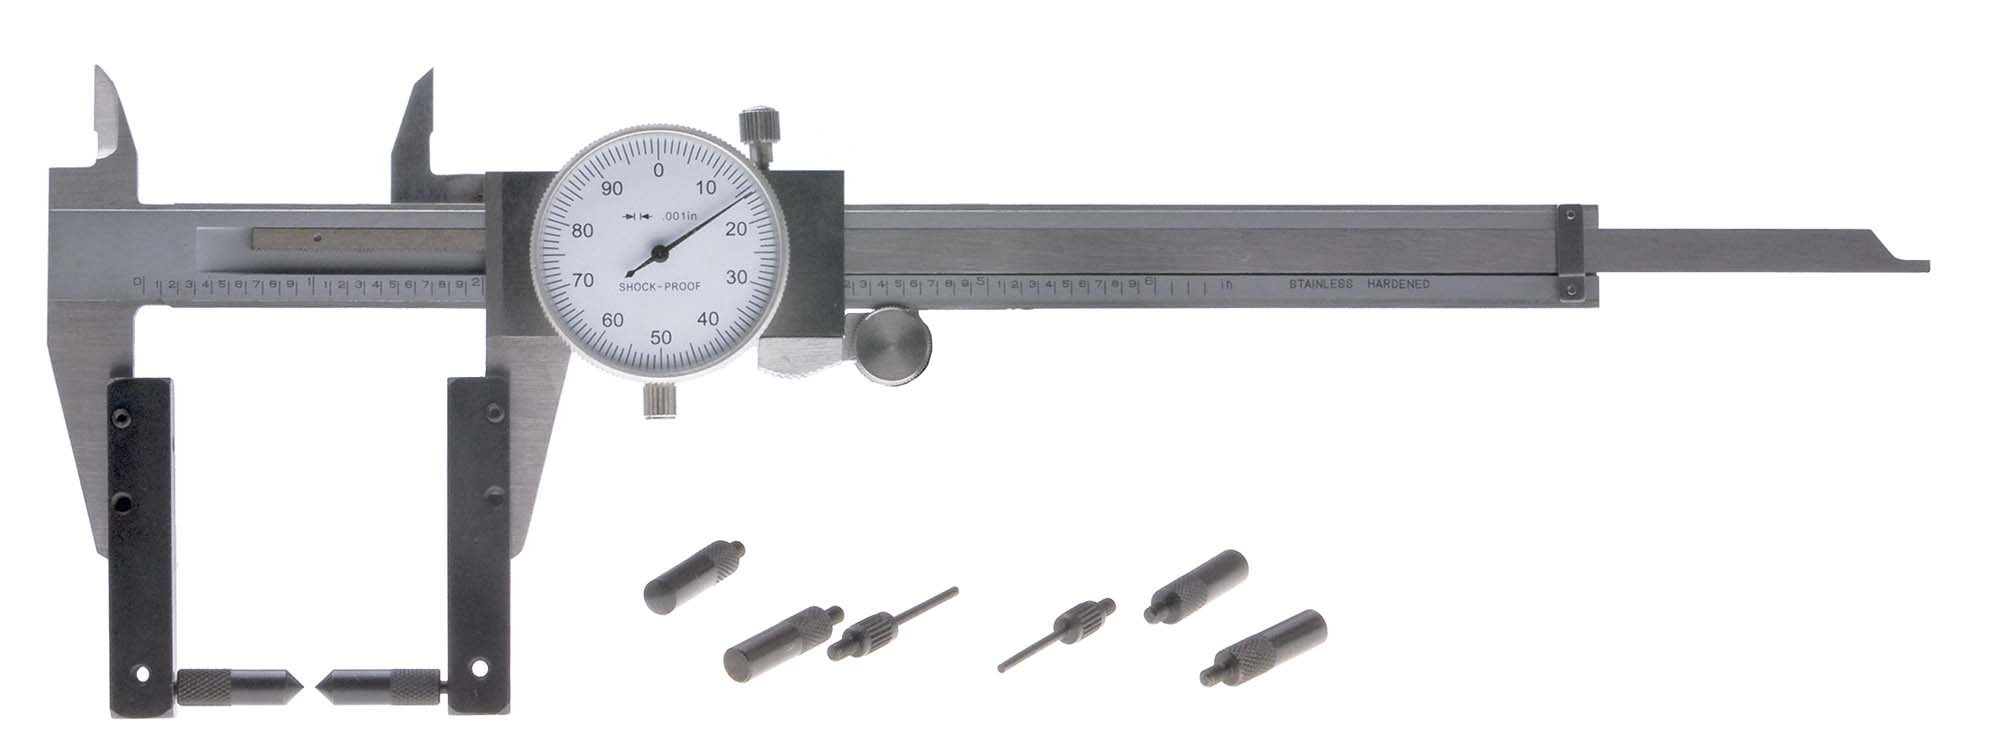 Accurate Mfg Z9020 Caliper Accessory Kit